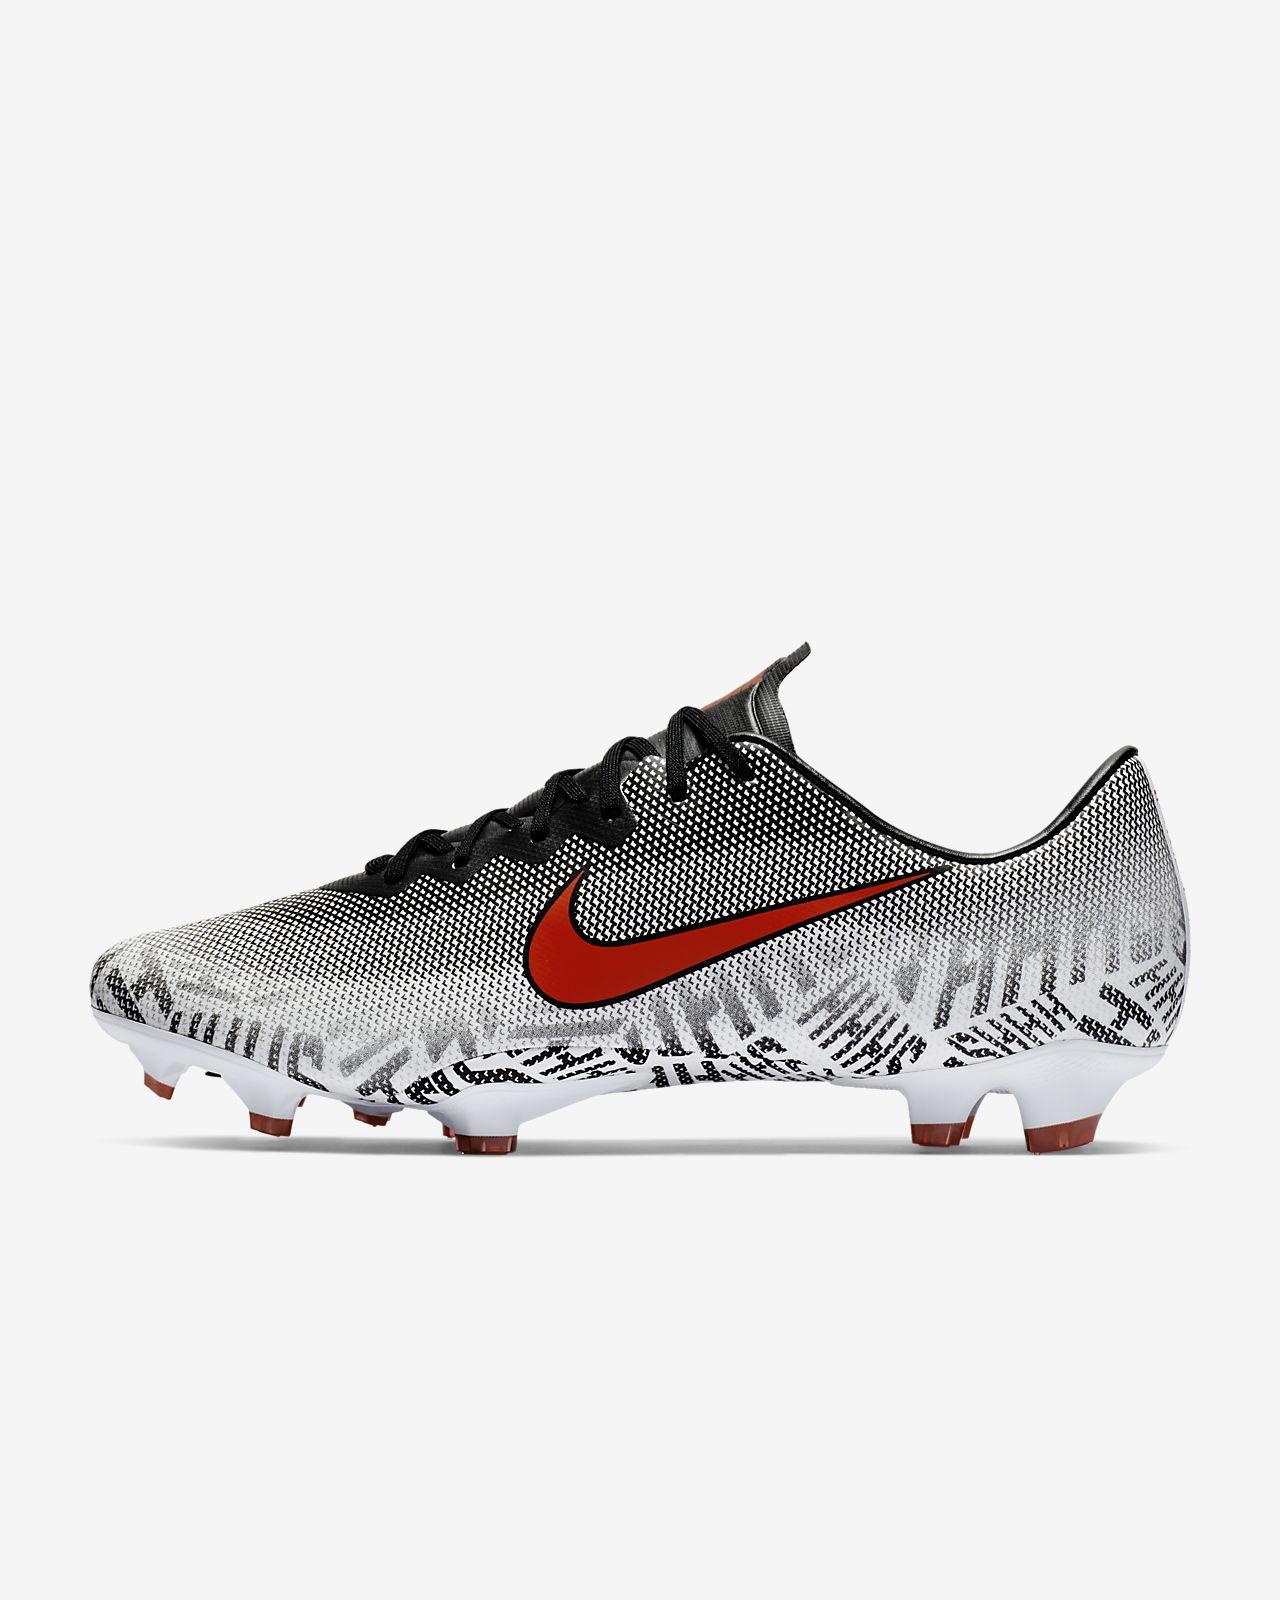 Calzado de fútbol para terreno firme para hombre Nike Mercurial Vapor XII Pro Neymar Jr